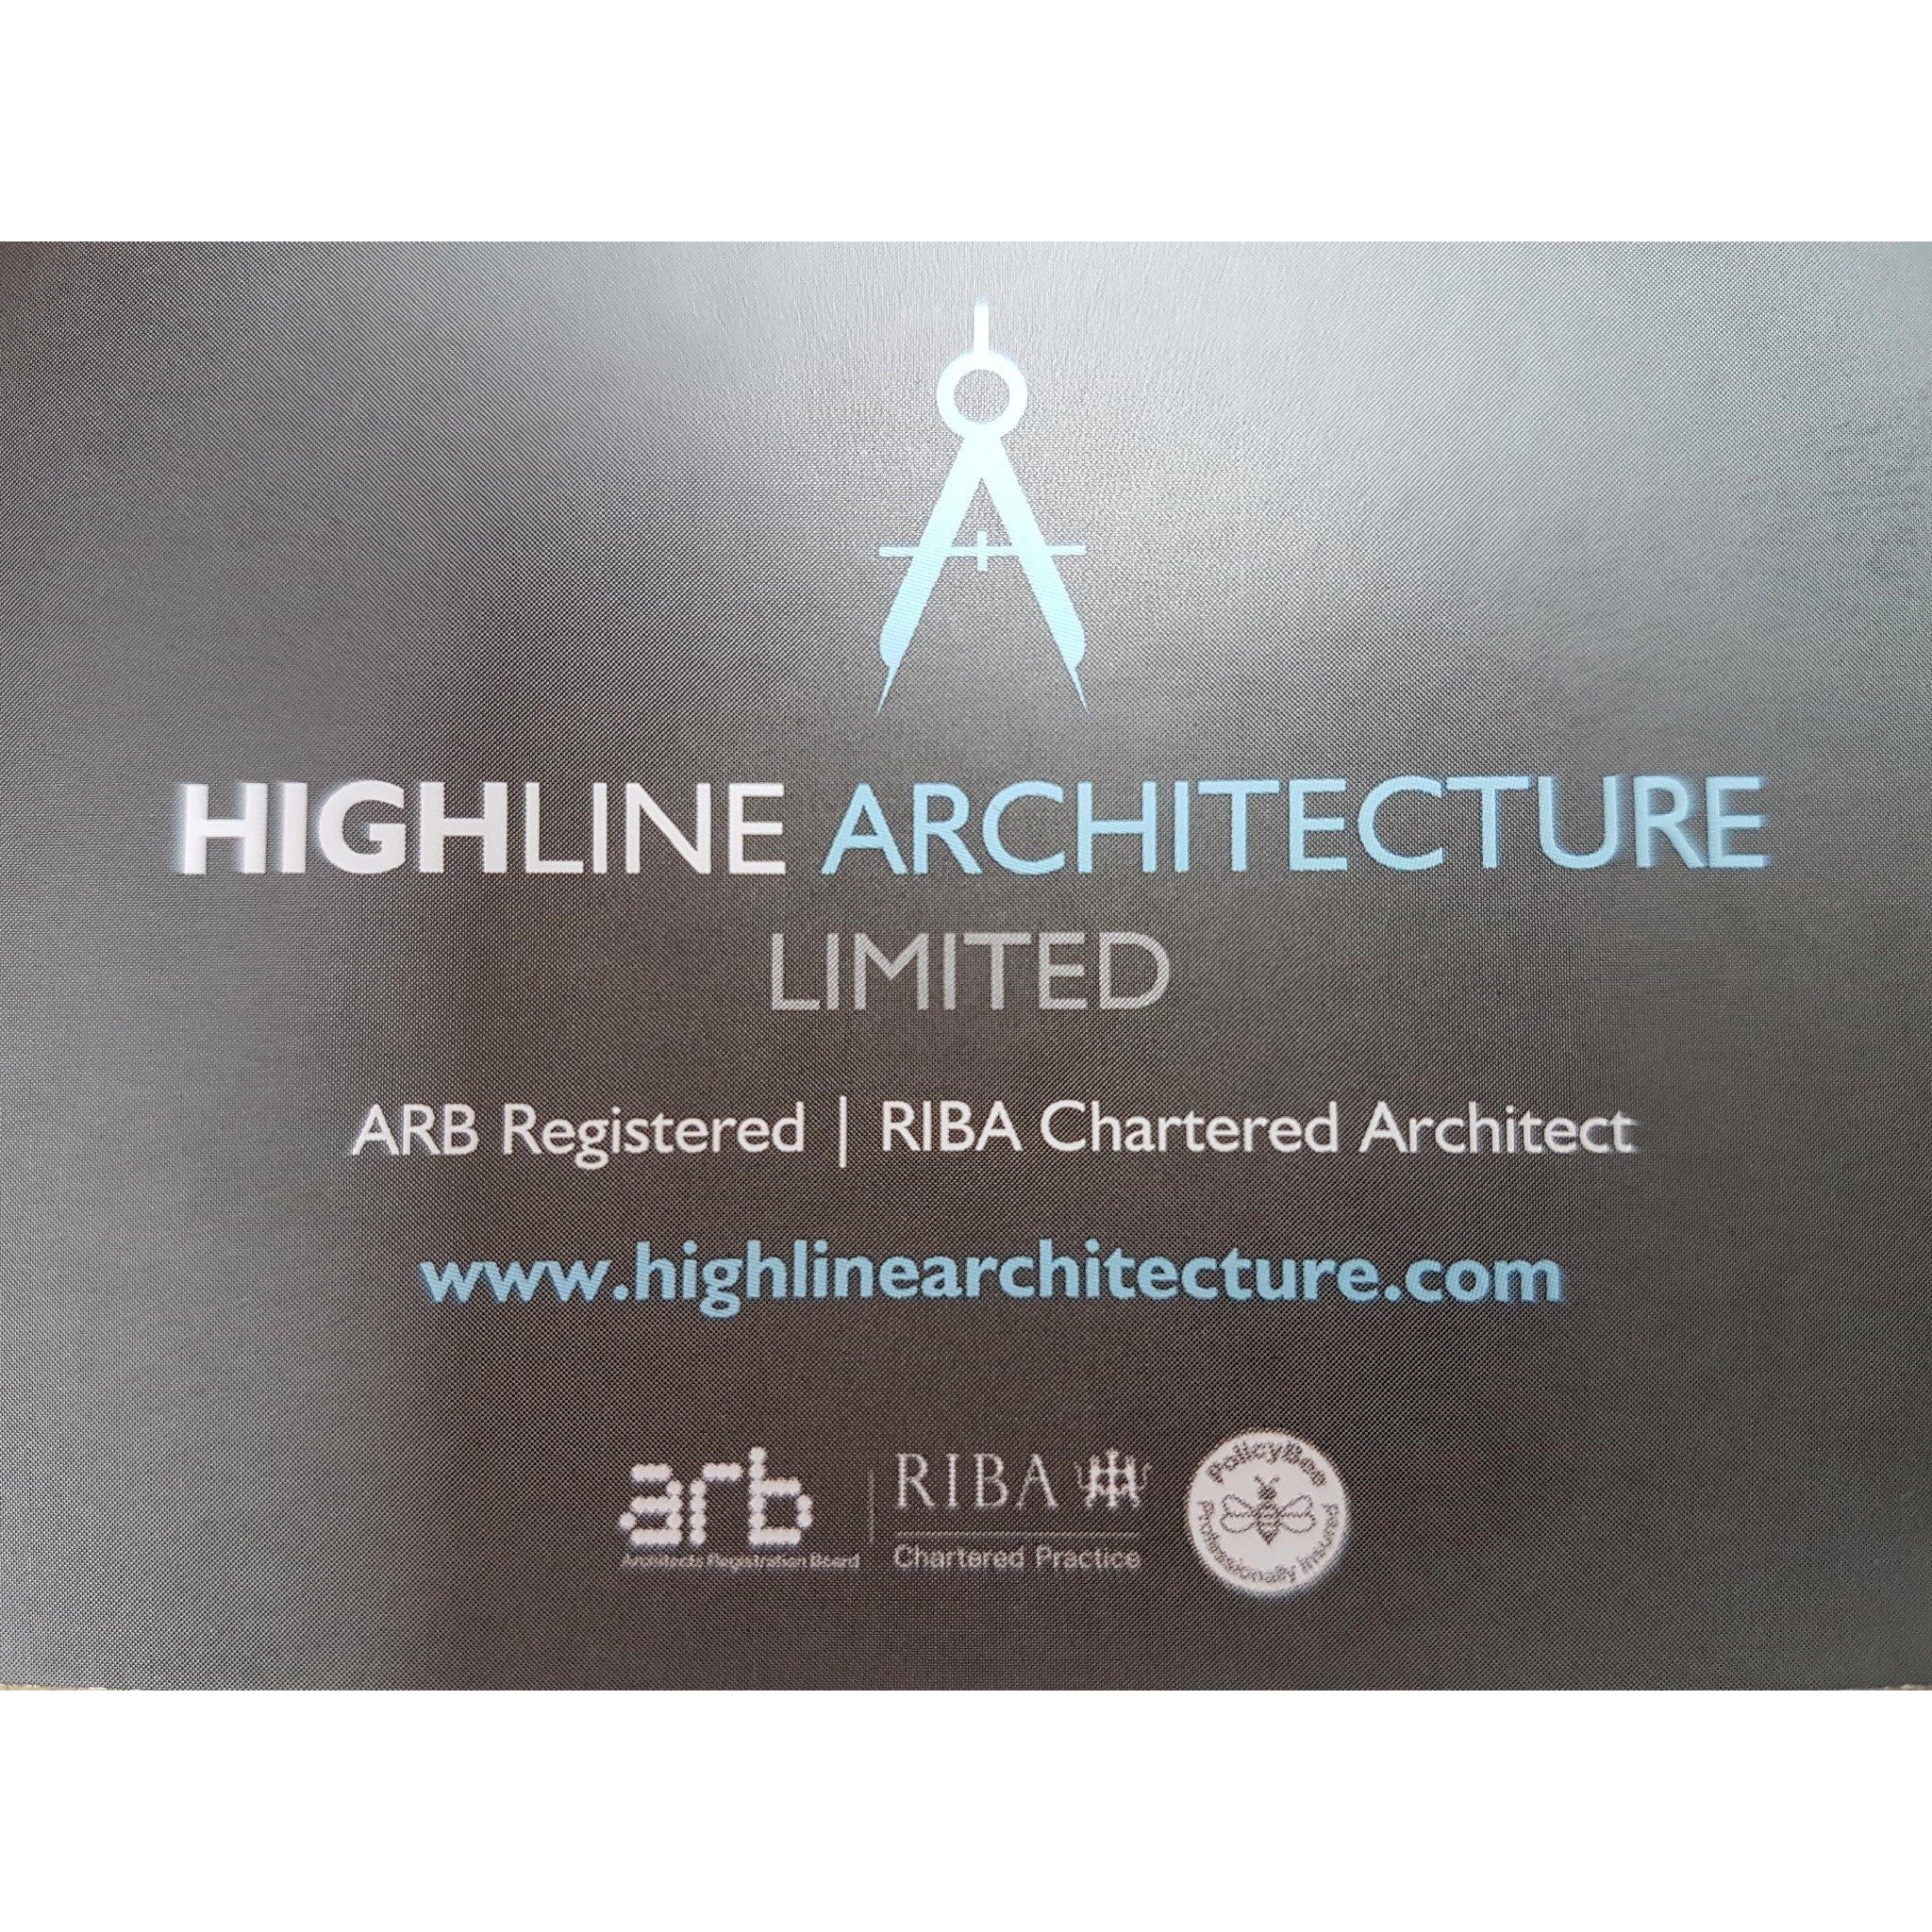 Highline Architecture Ltd - Liverpool, Merseyside L37 1PQ - 07818 413649 | ShowMeLocal.com